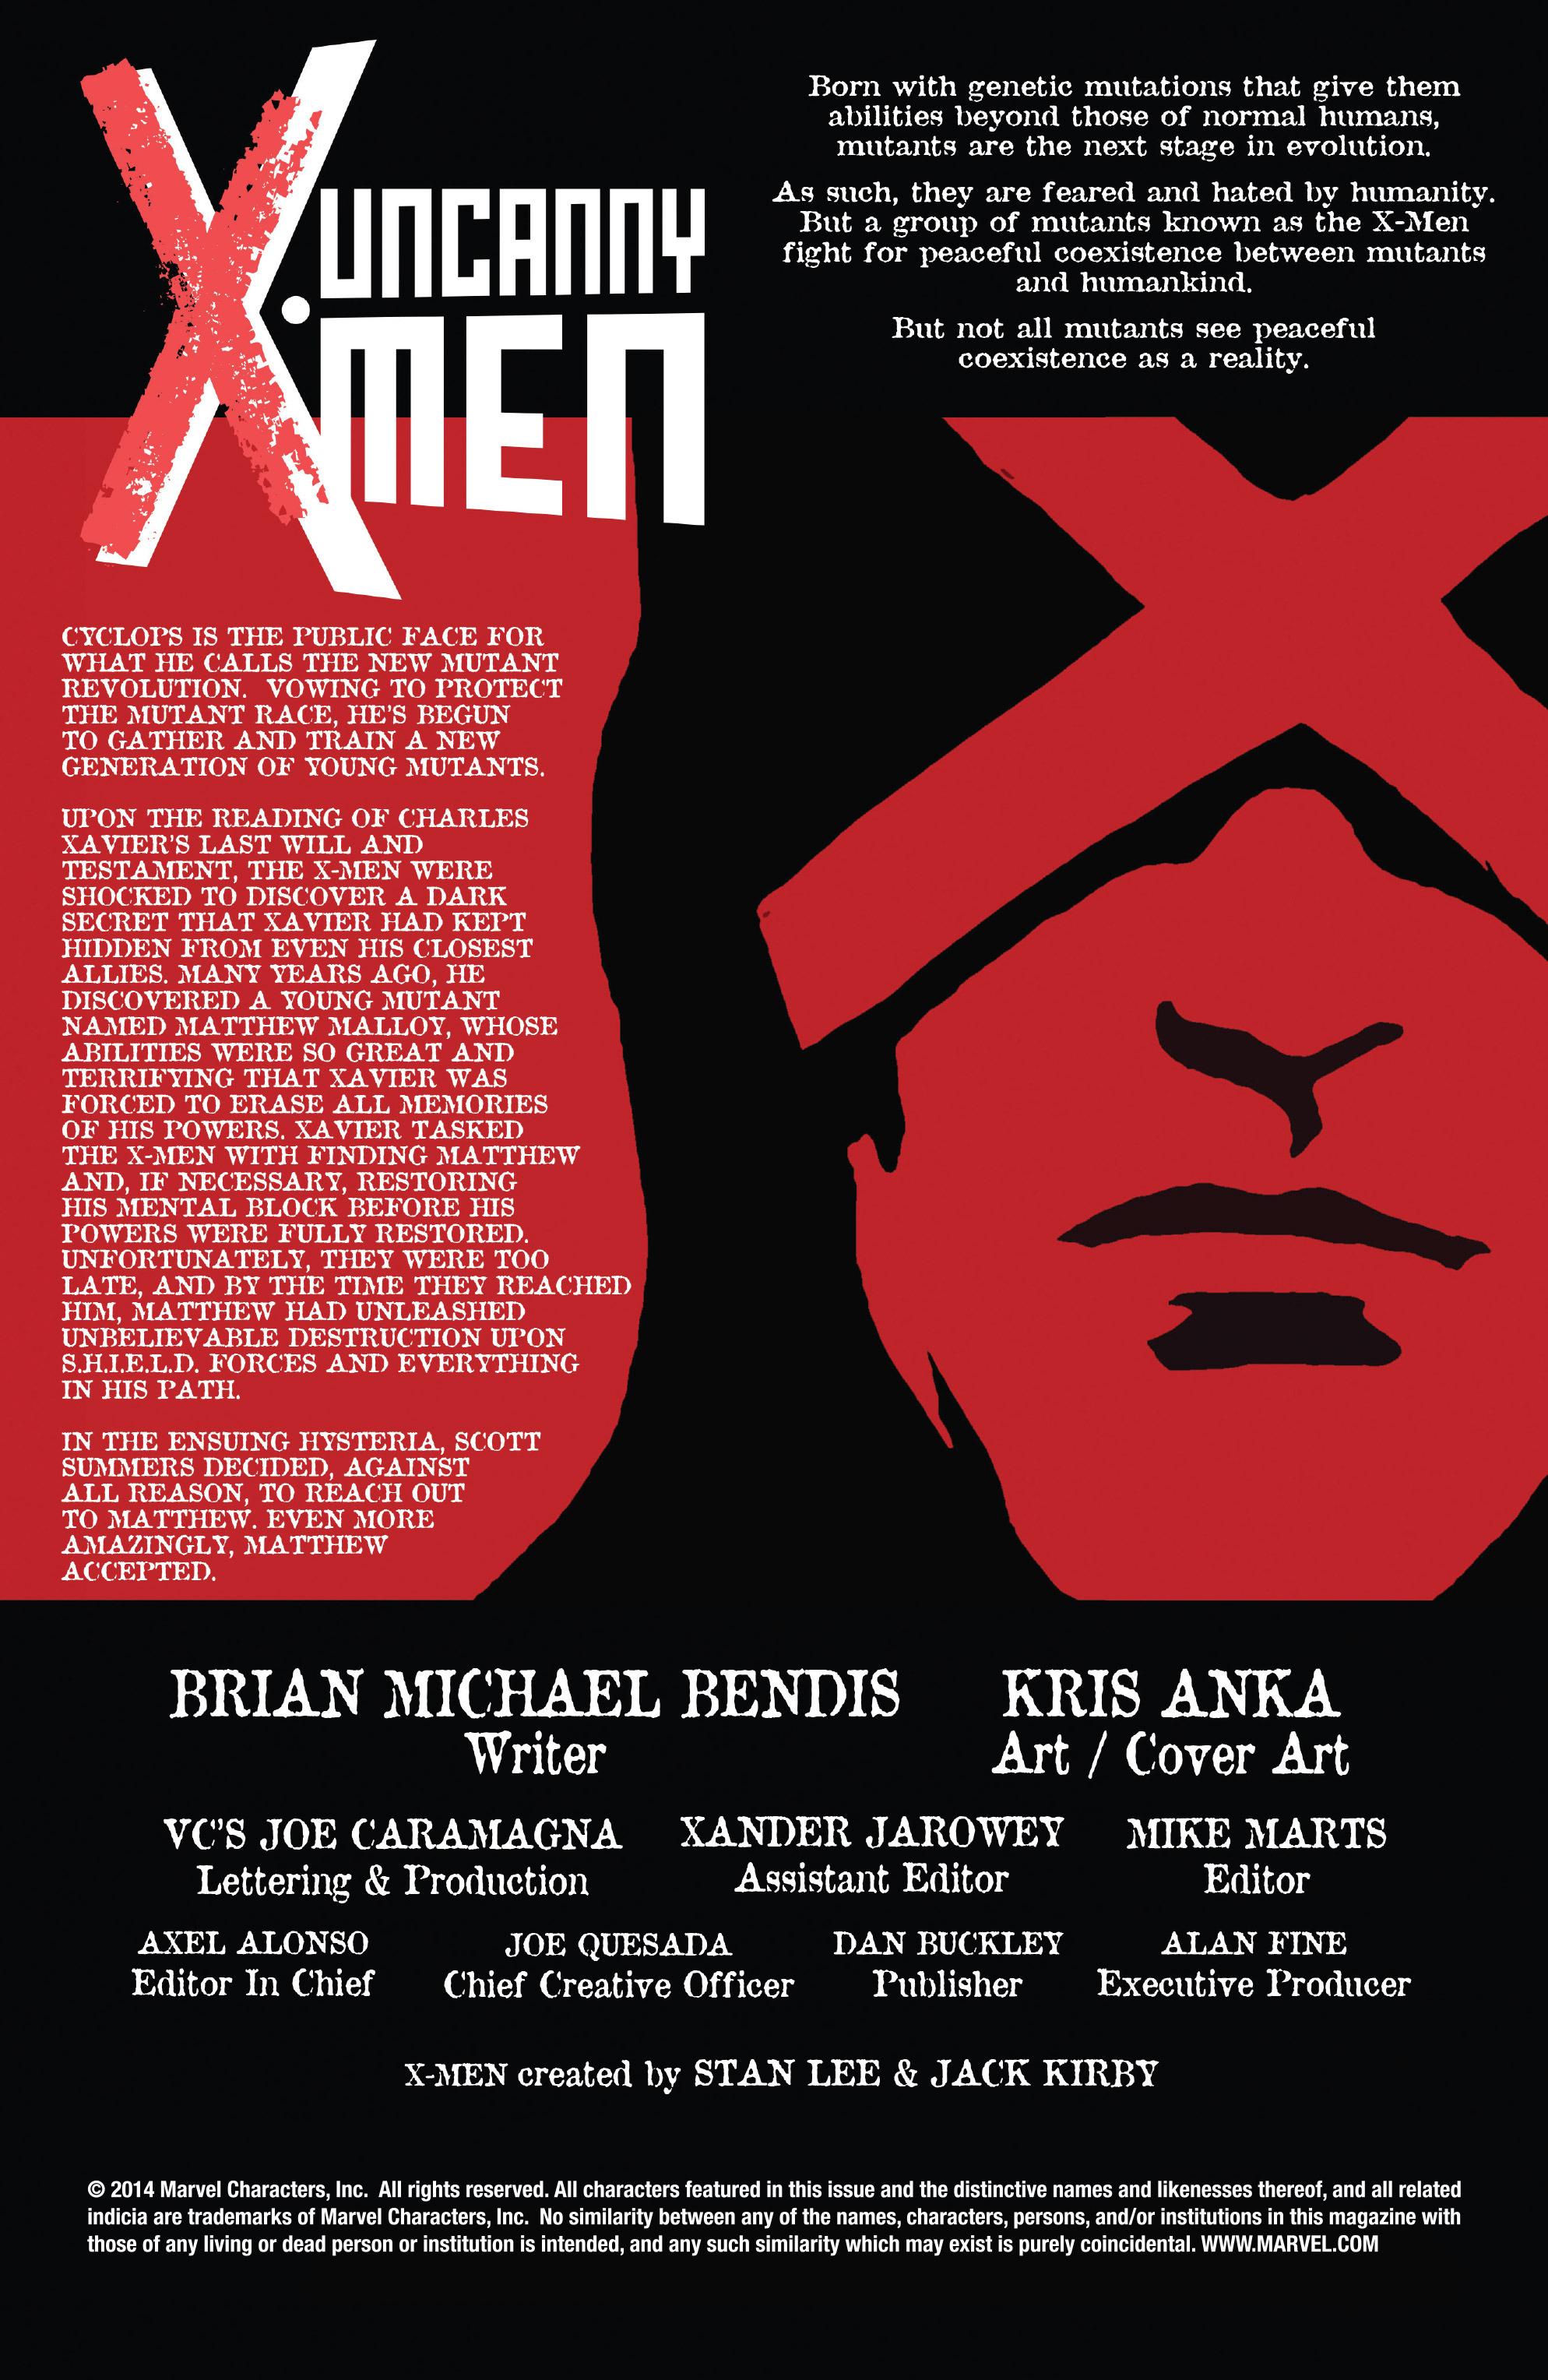 Read online Uncanny X-Men (2013) comic -  Issue # _TPB 5 - The Omega Mutant - 40